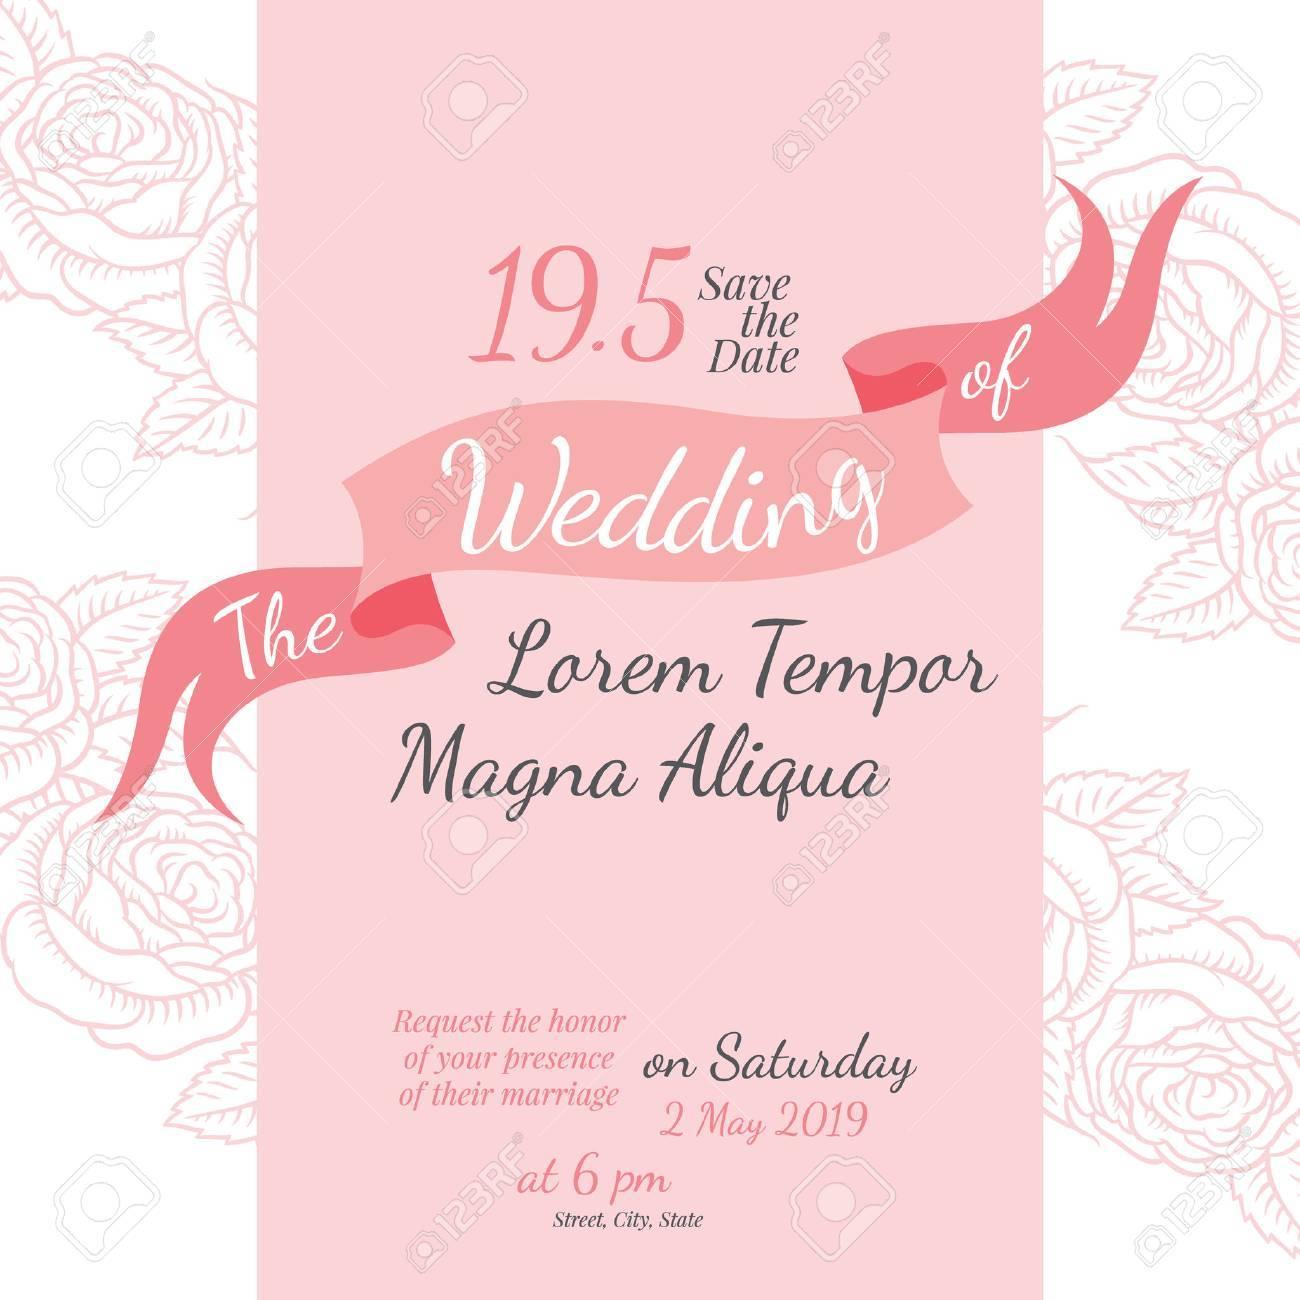 Invitation bridal shower card with rose flower vector template invitation bridal shower card with rose flower vector template for invitations flyers postcards stopboris Images